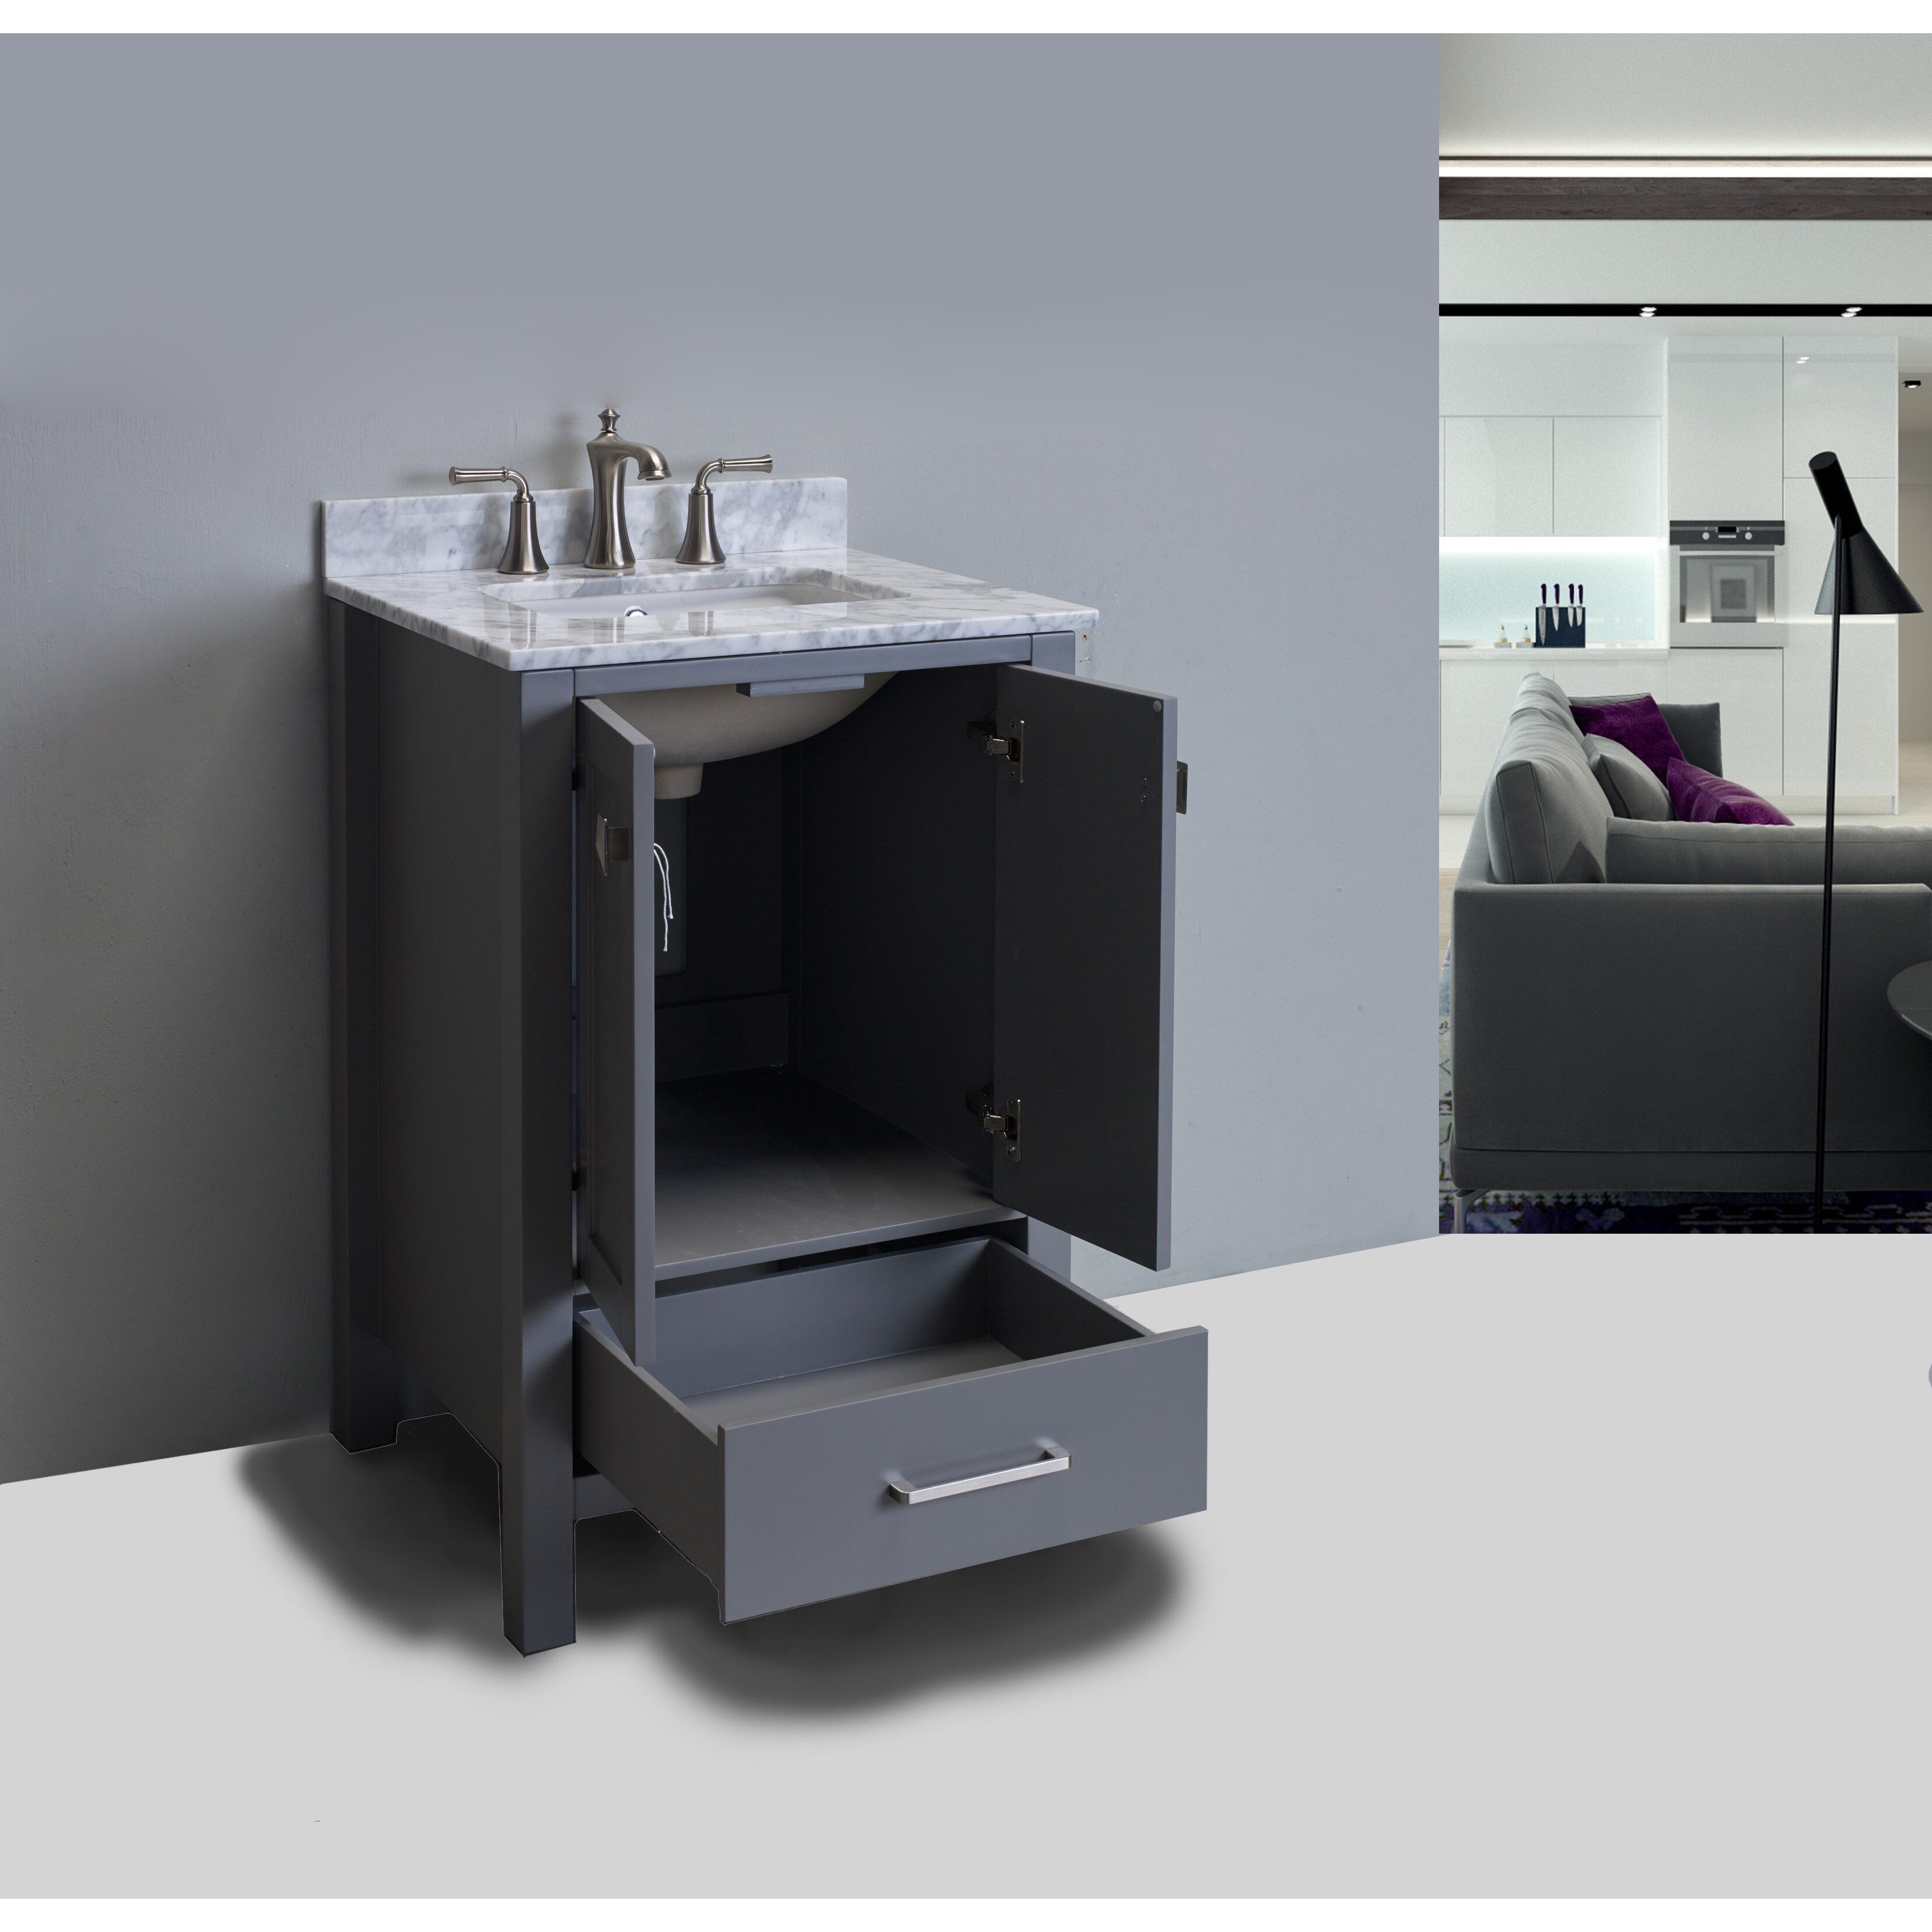 Just Cabinets Aberdeen Eviva Aberdeen 24 Single Bathroom Vanity Set Wayfair